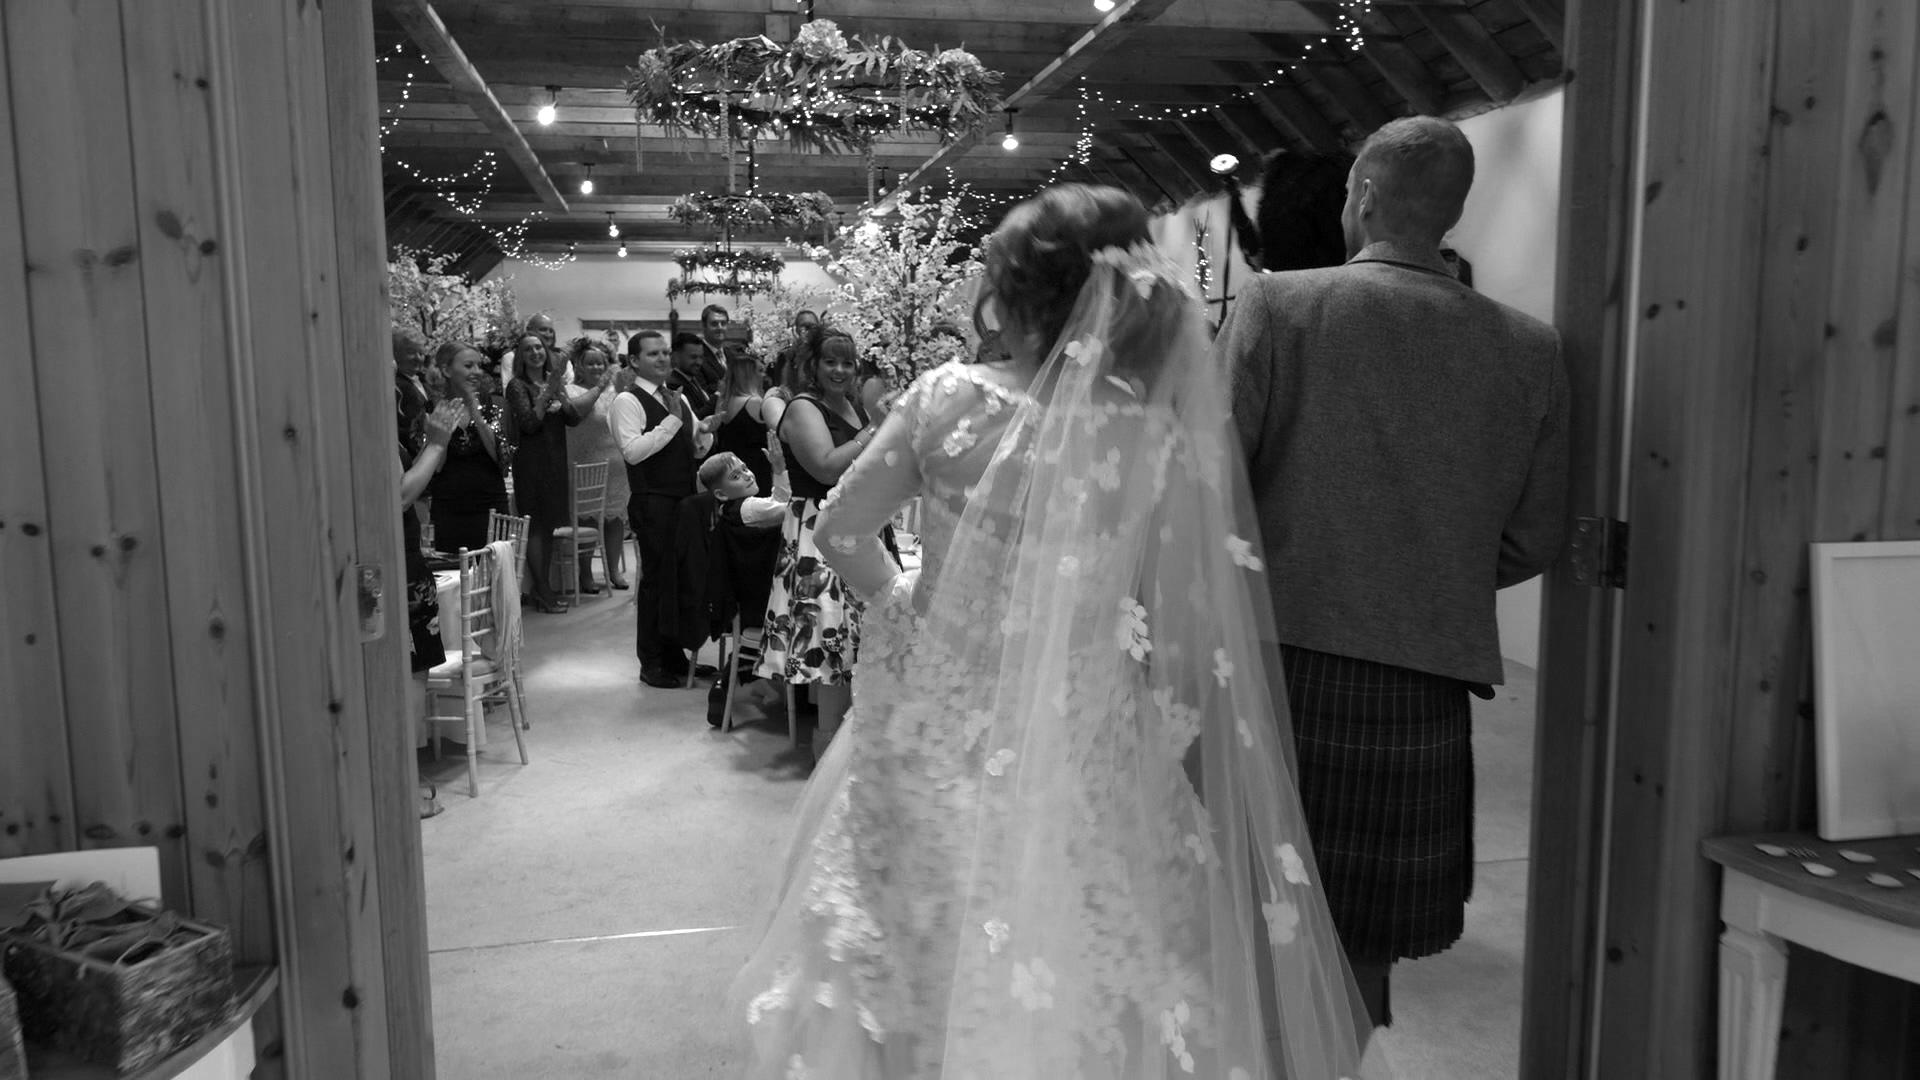 ASWANLEY-SUMMER-WEDDING (15).jpg